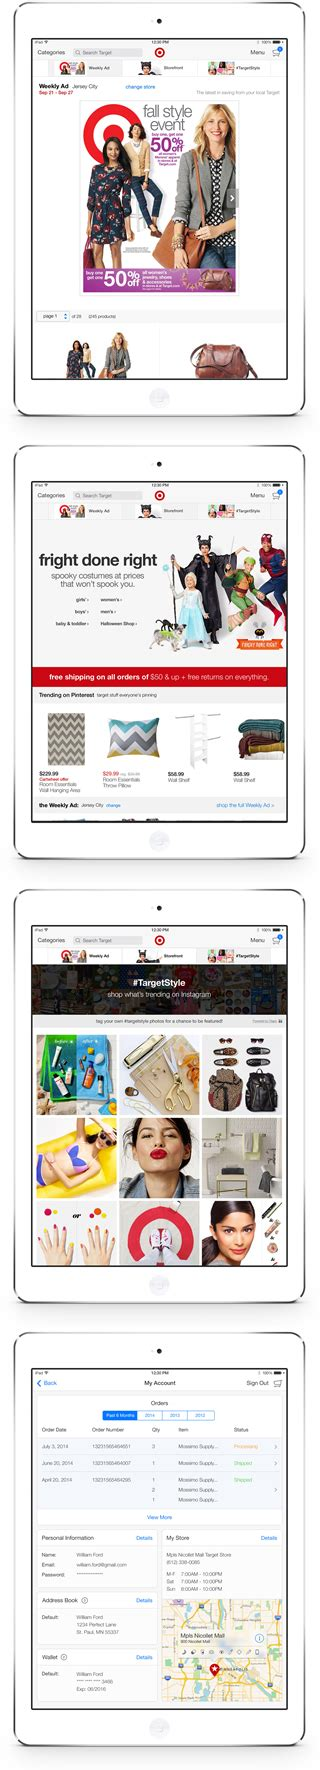 target mobili target mobile app for makes shopping mobilevillage 174